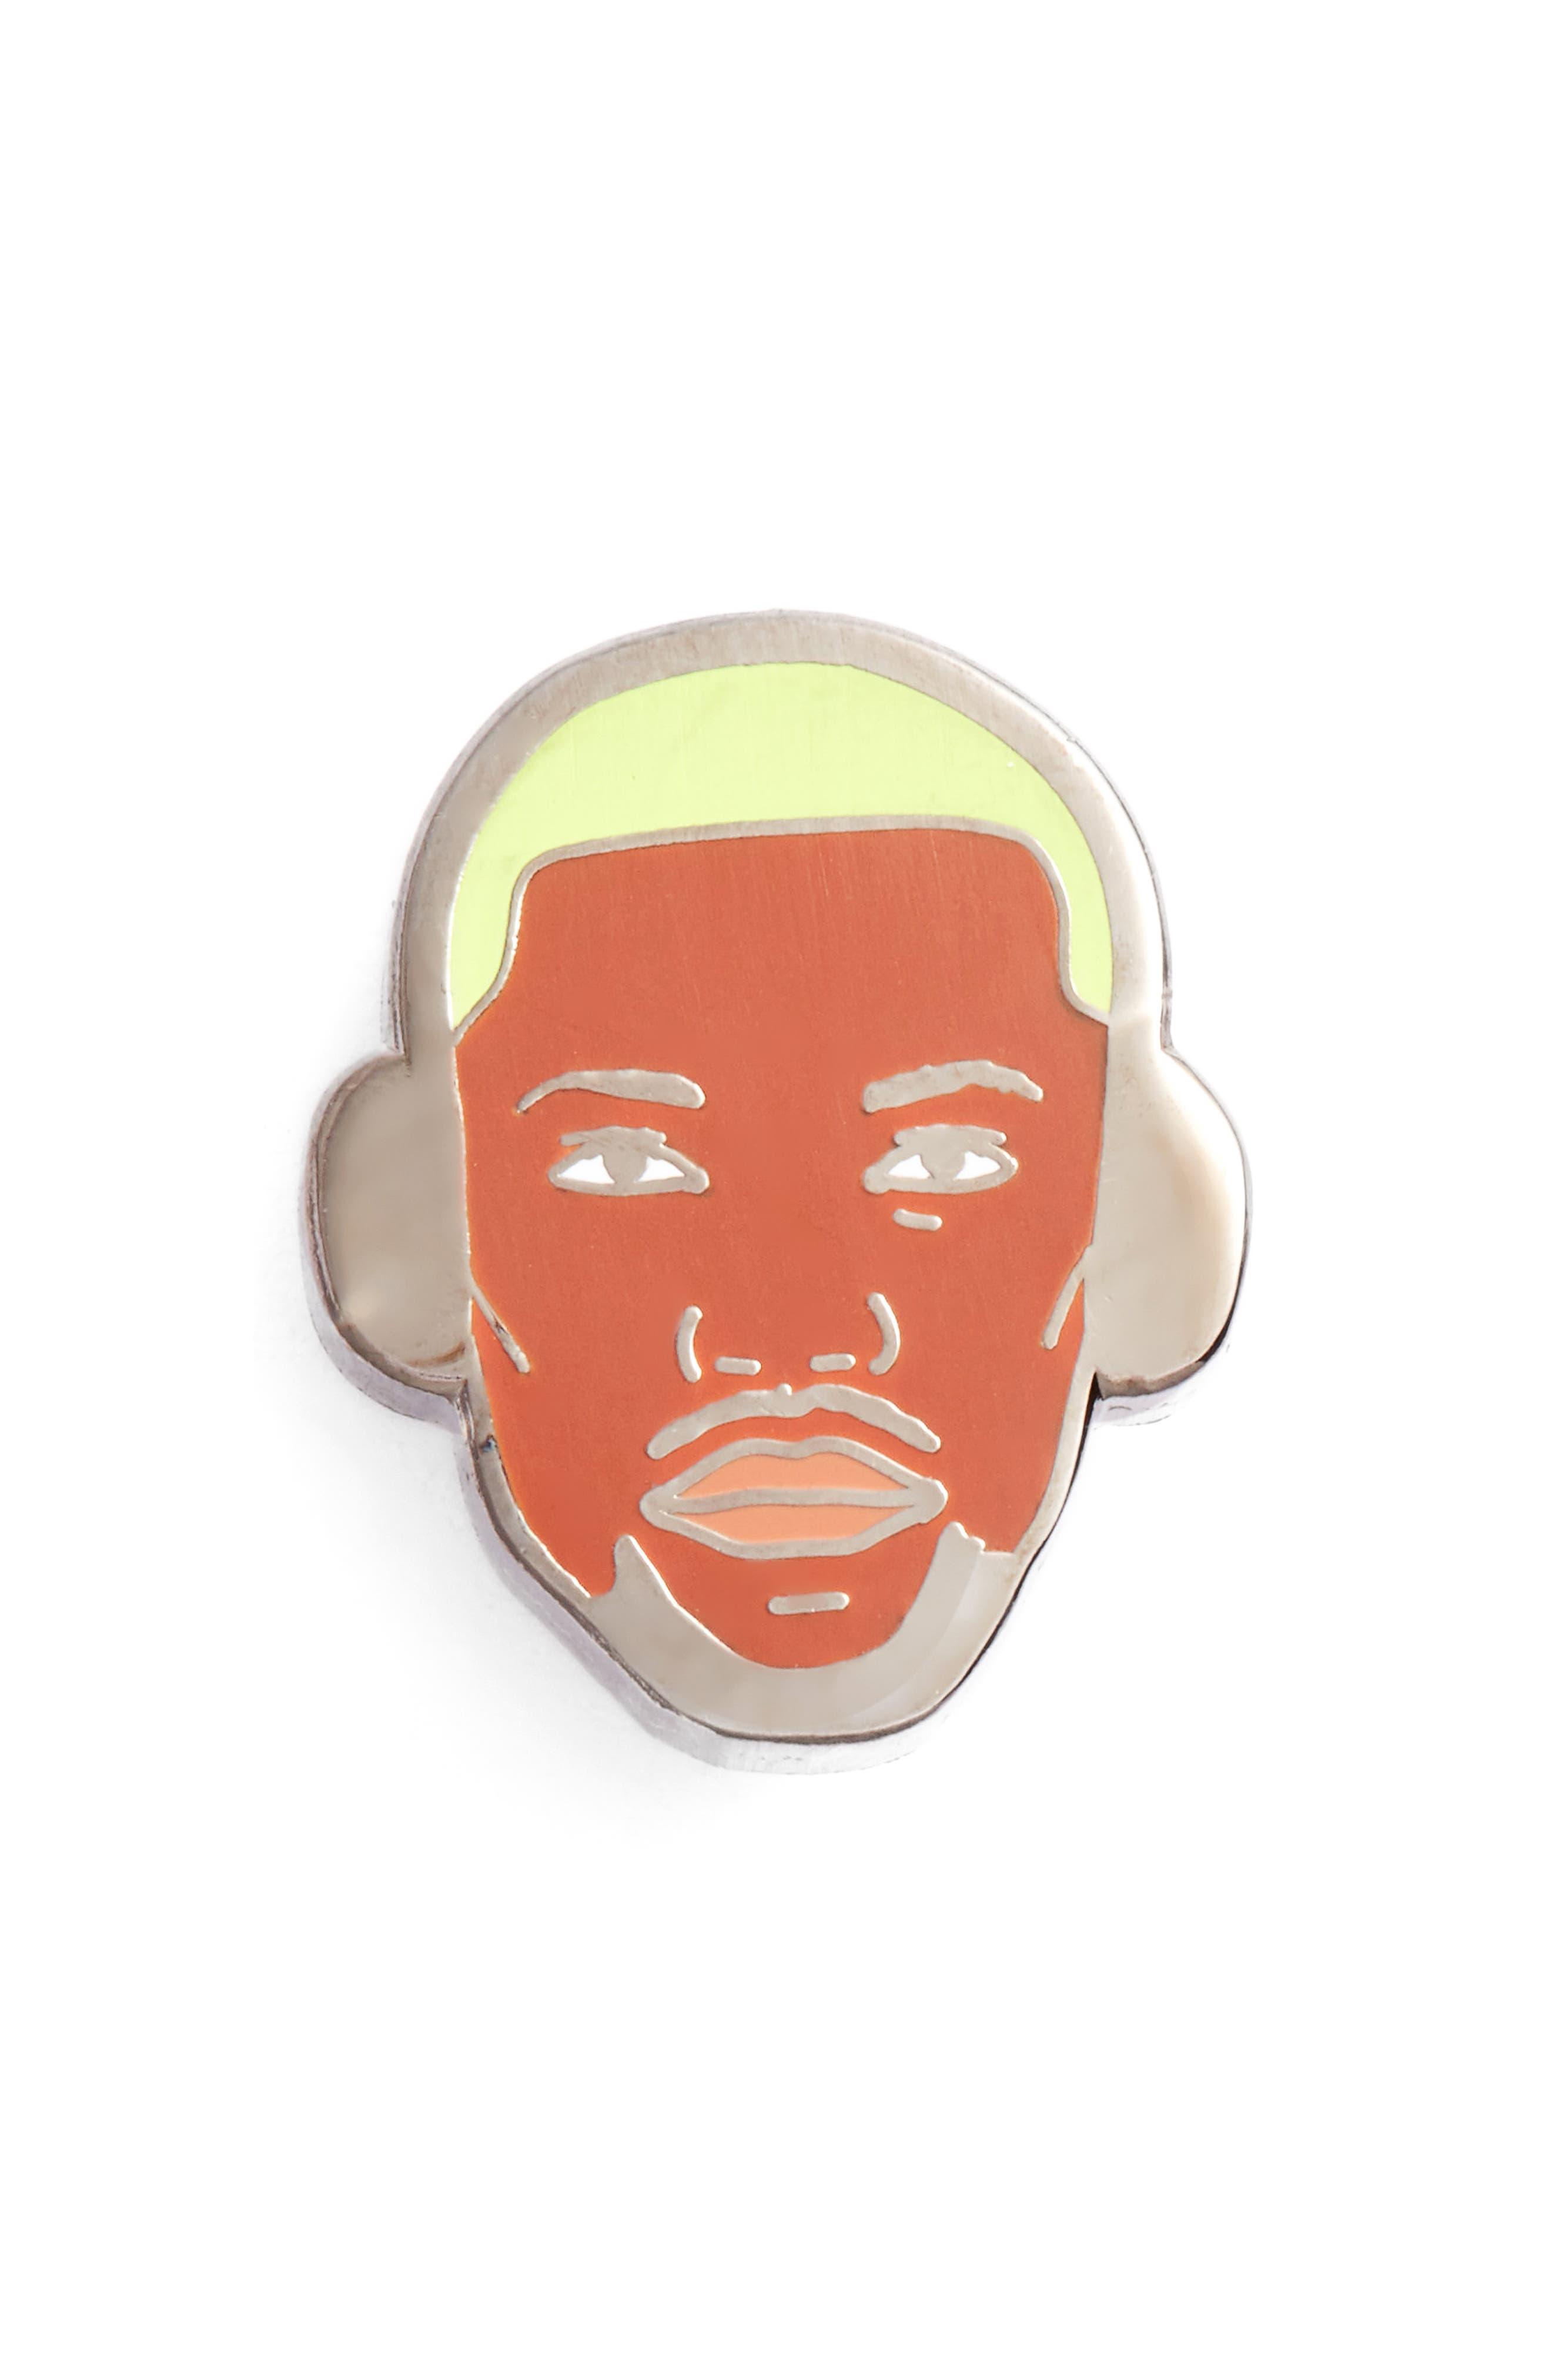 PINTRILL Frank Ocean Fashion Accessory Pin